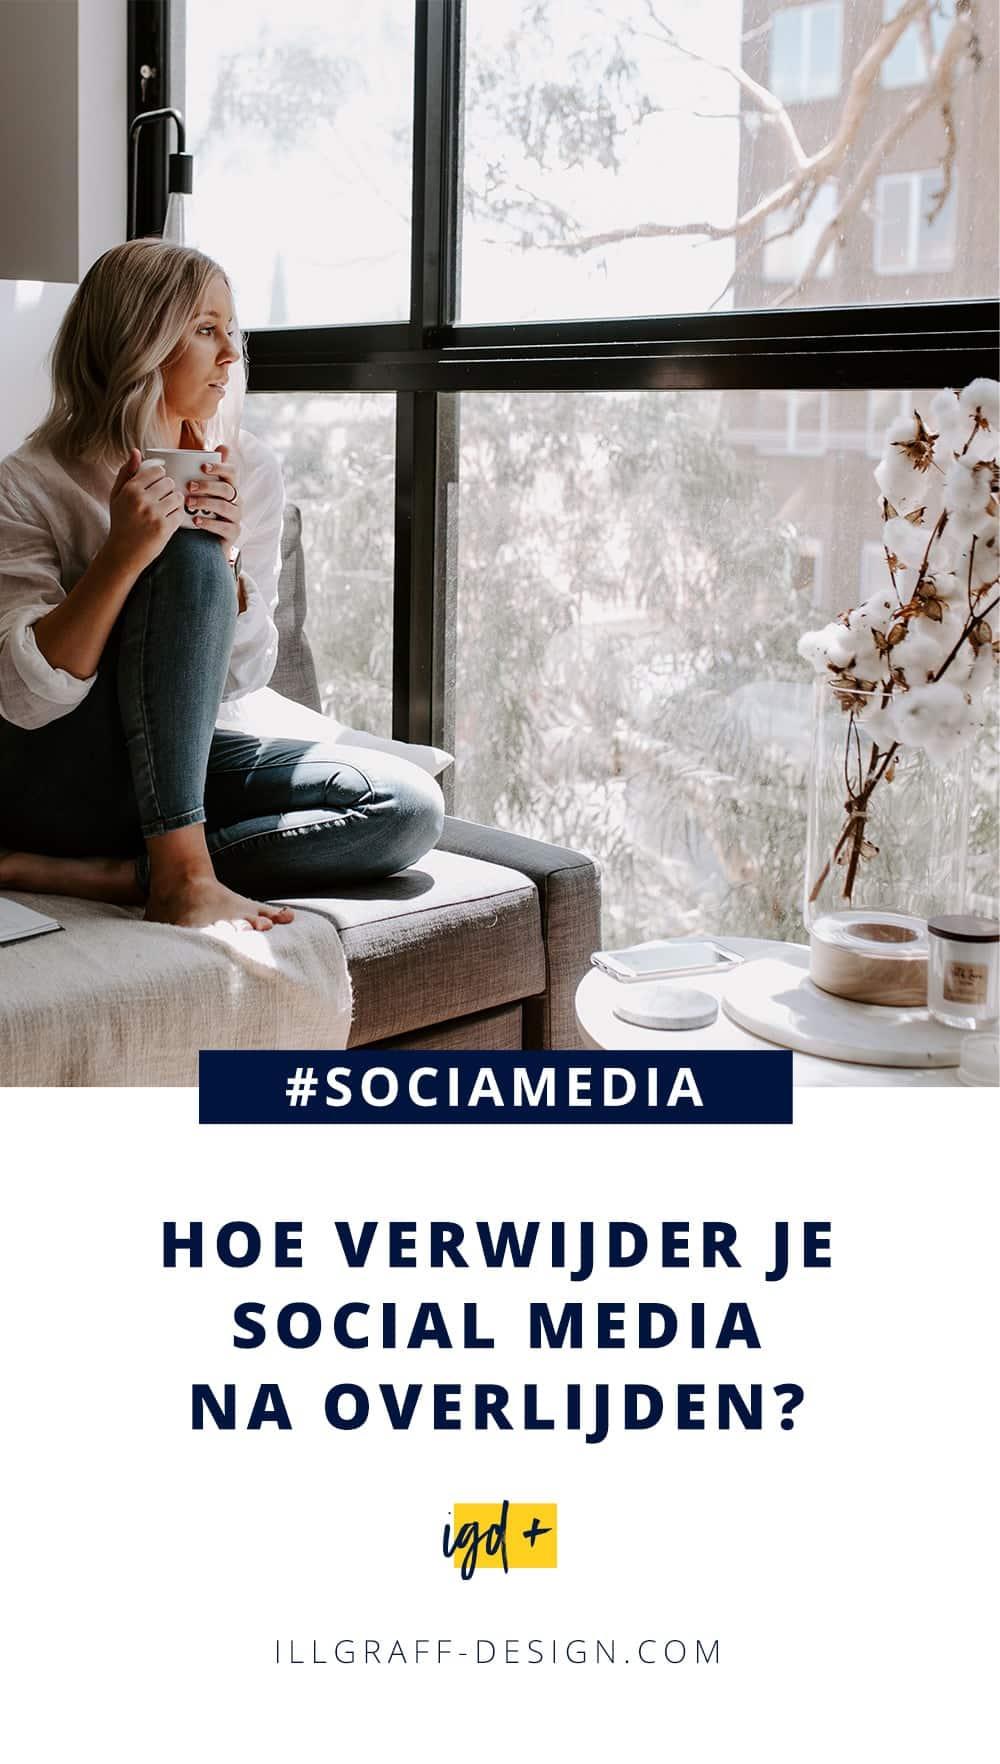 Social media, Internet en overlijden